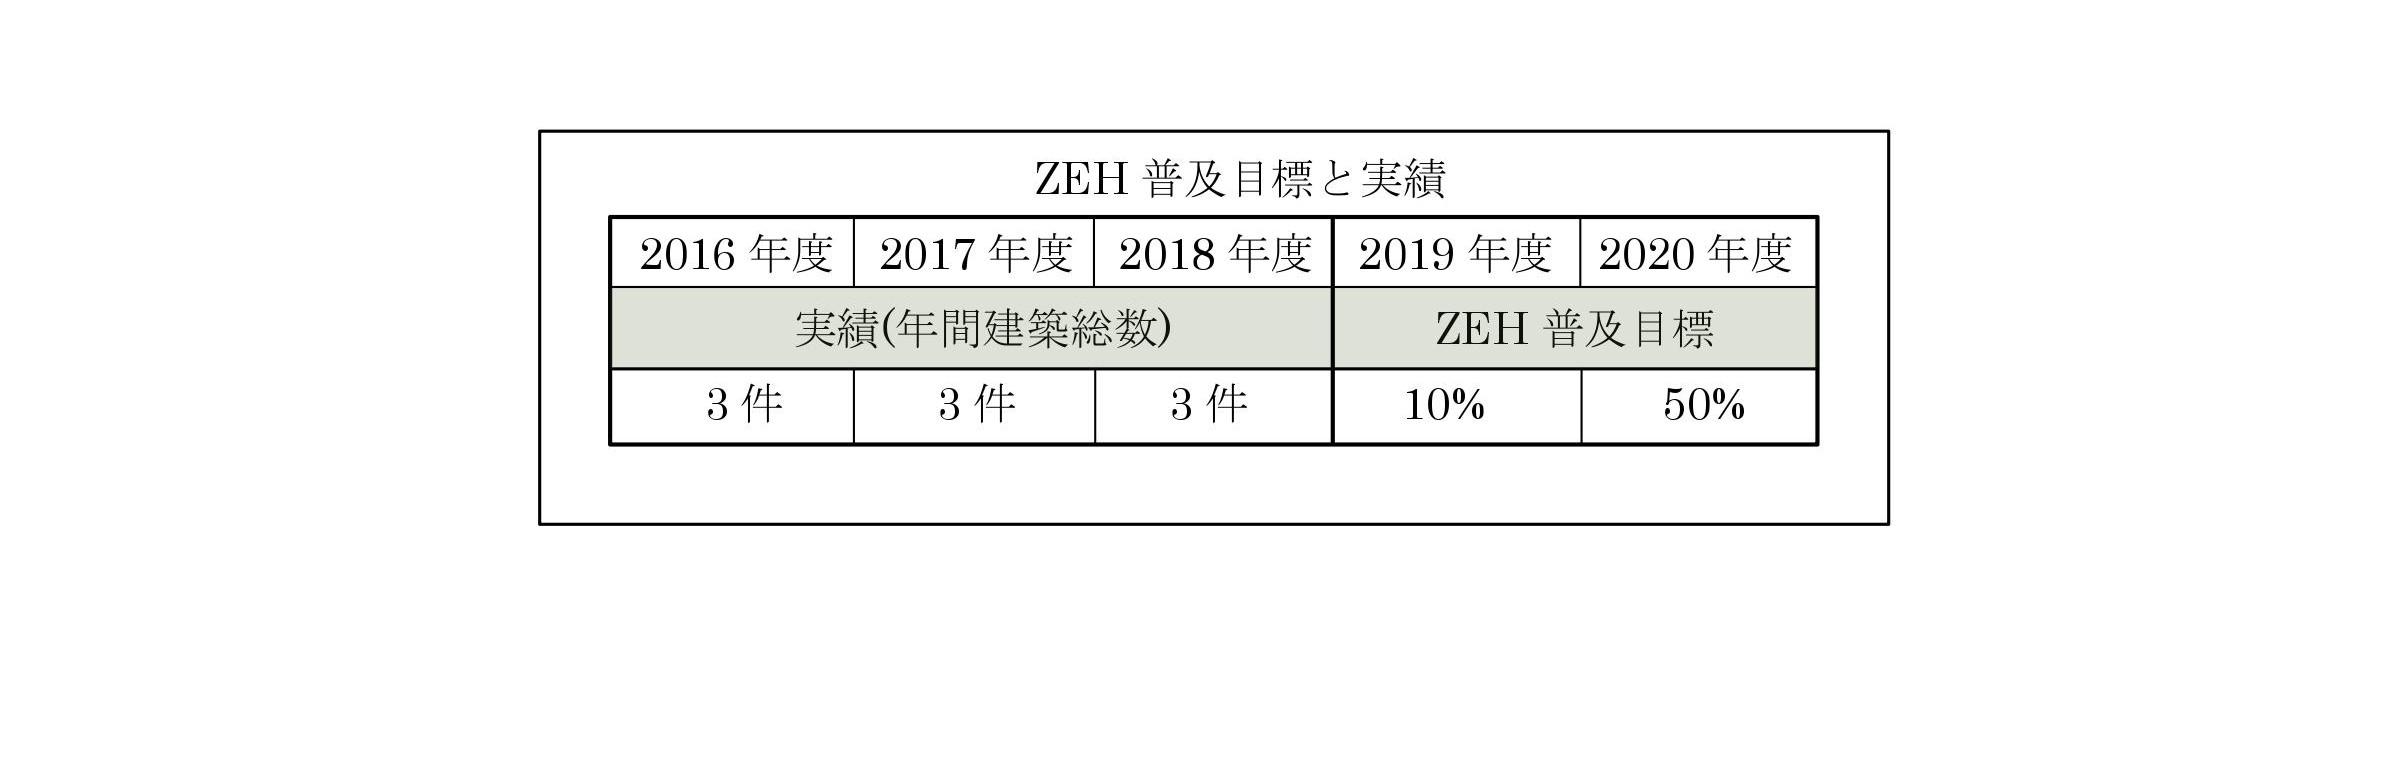 ZEH普及目標と実績の公表